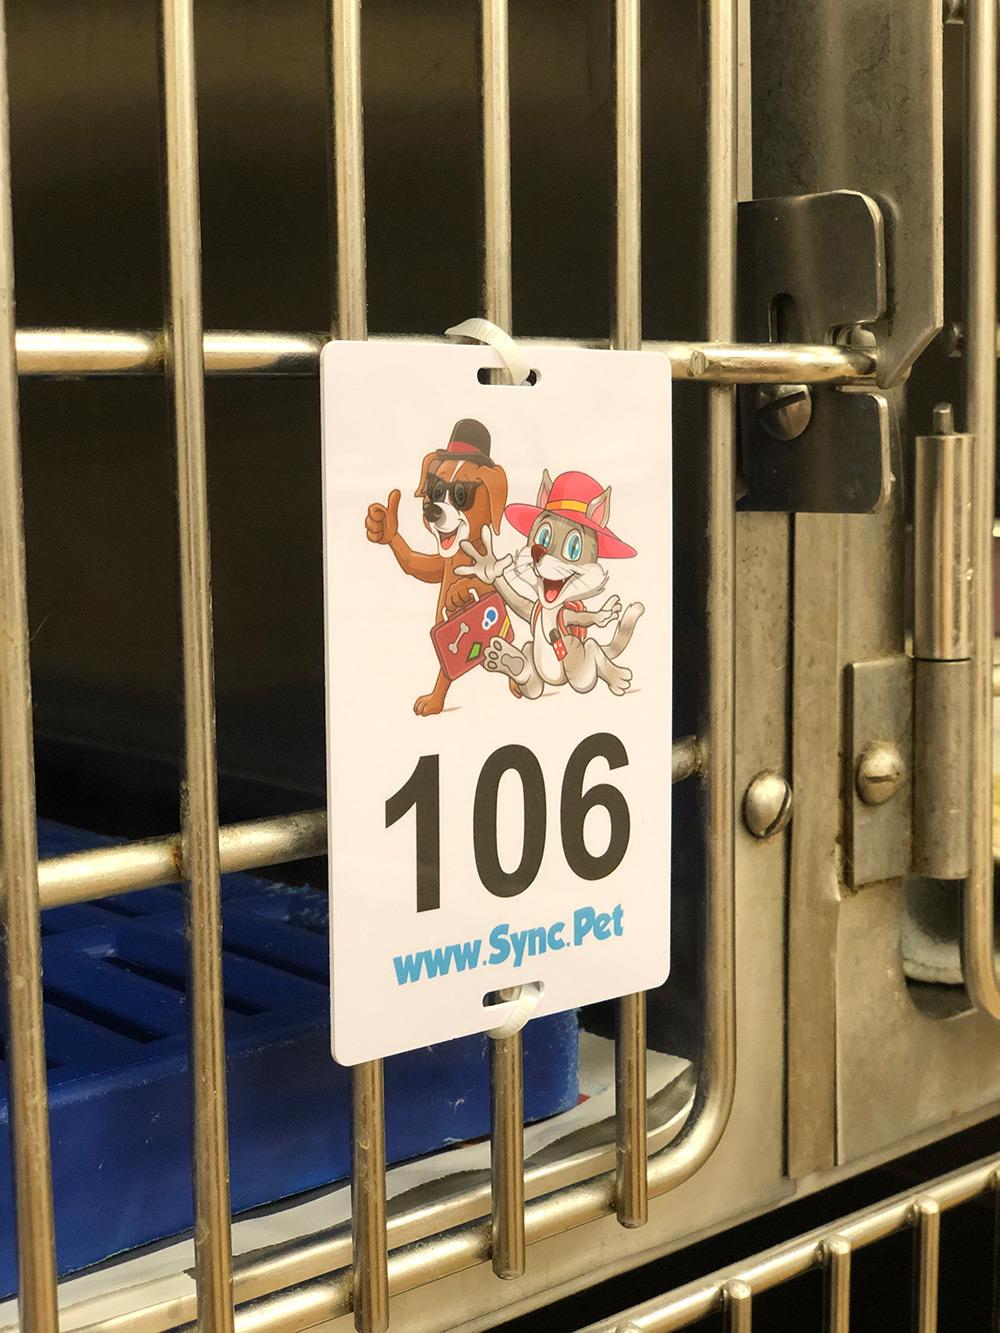 Sync Pet Cage